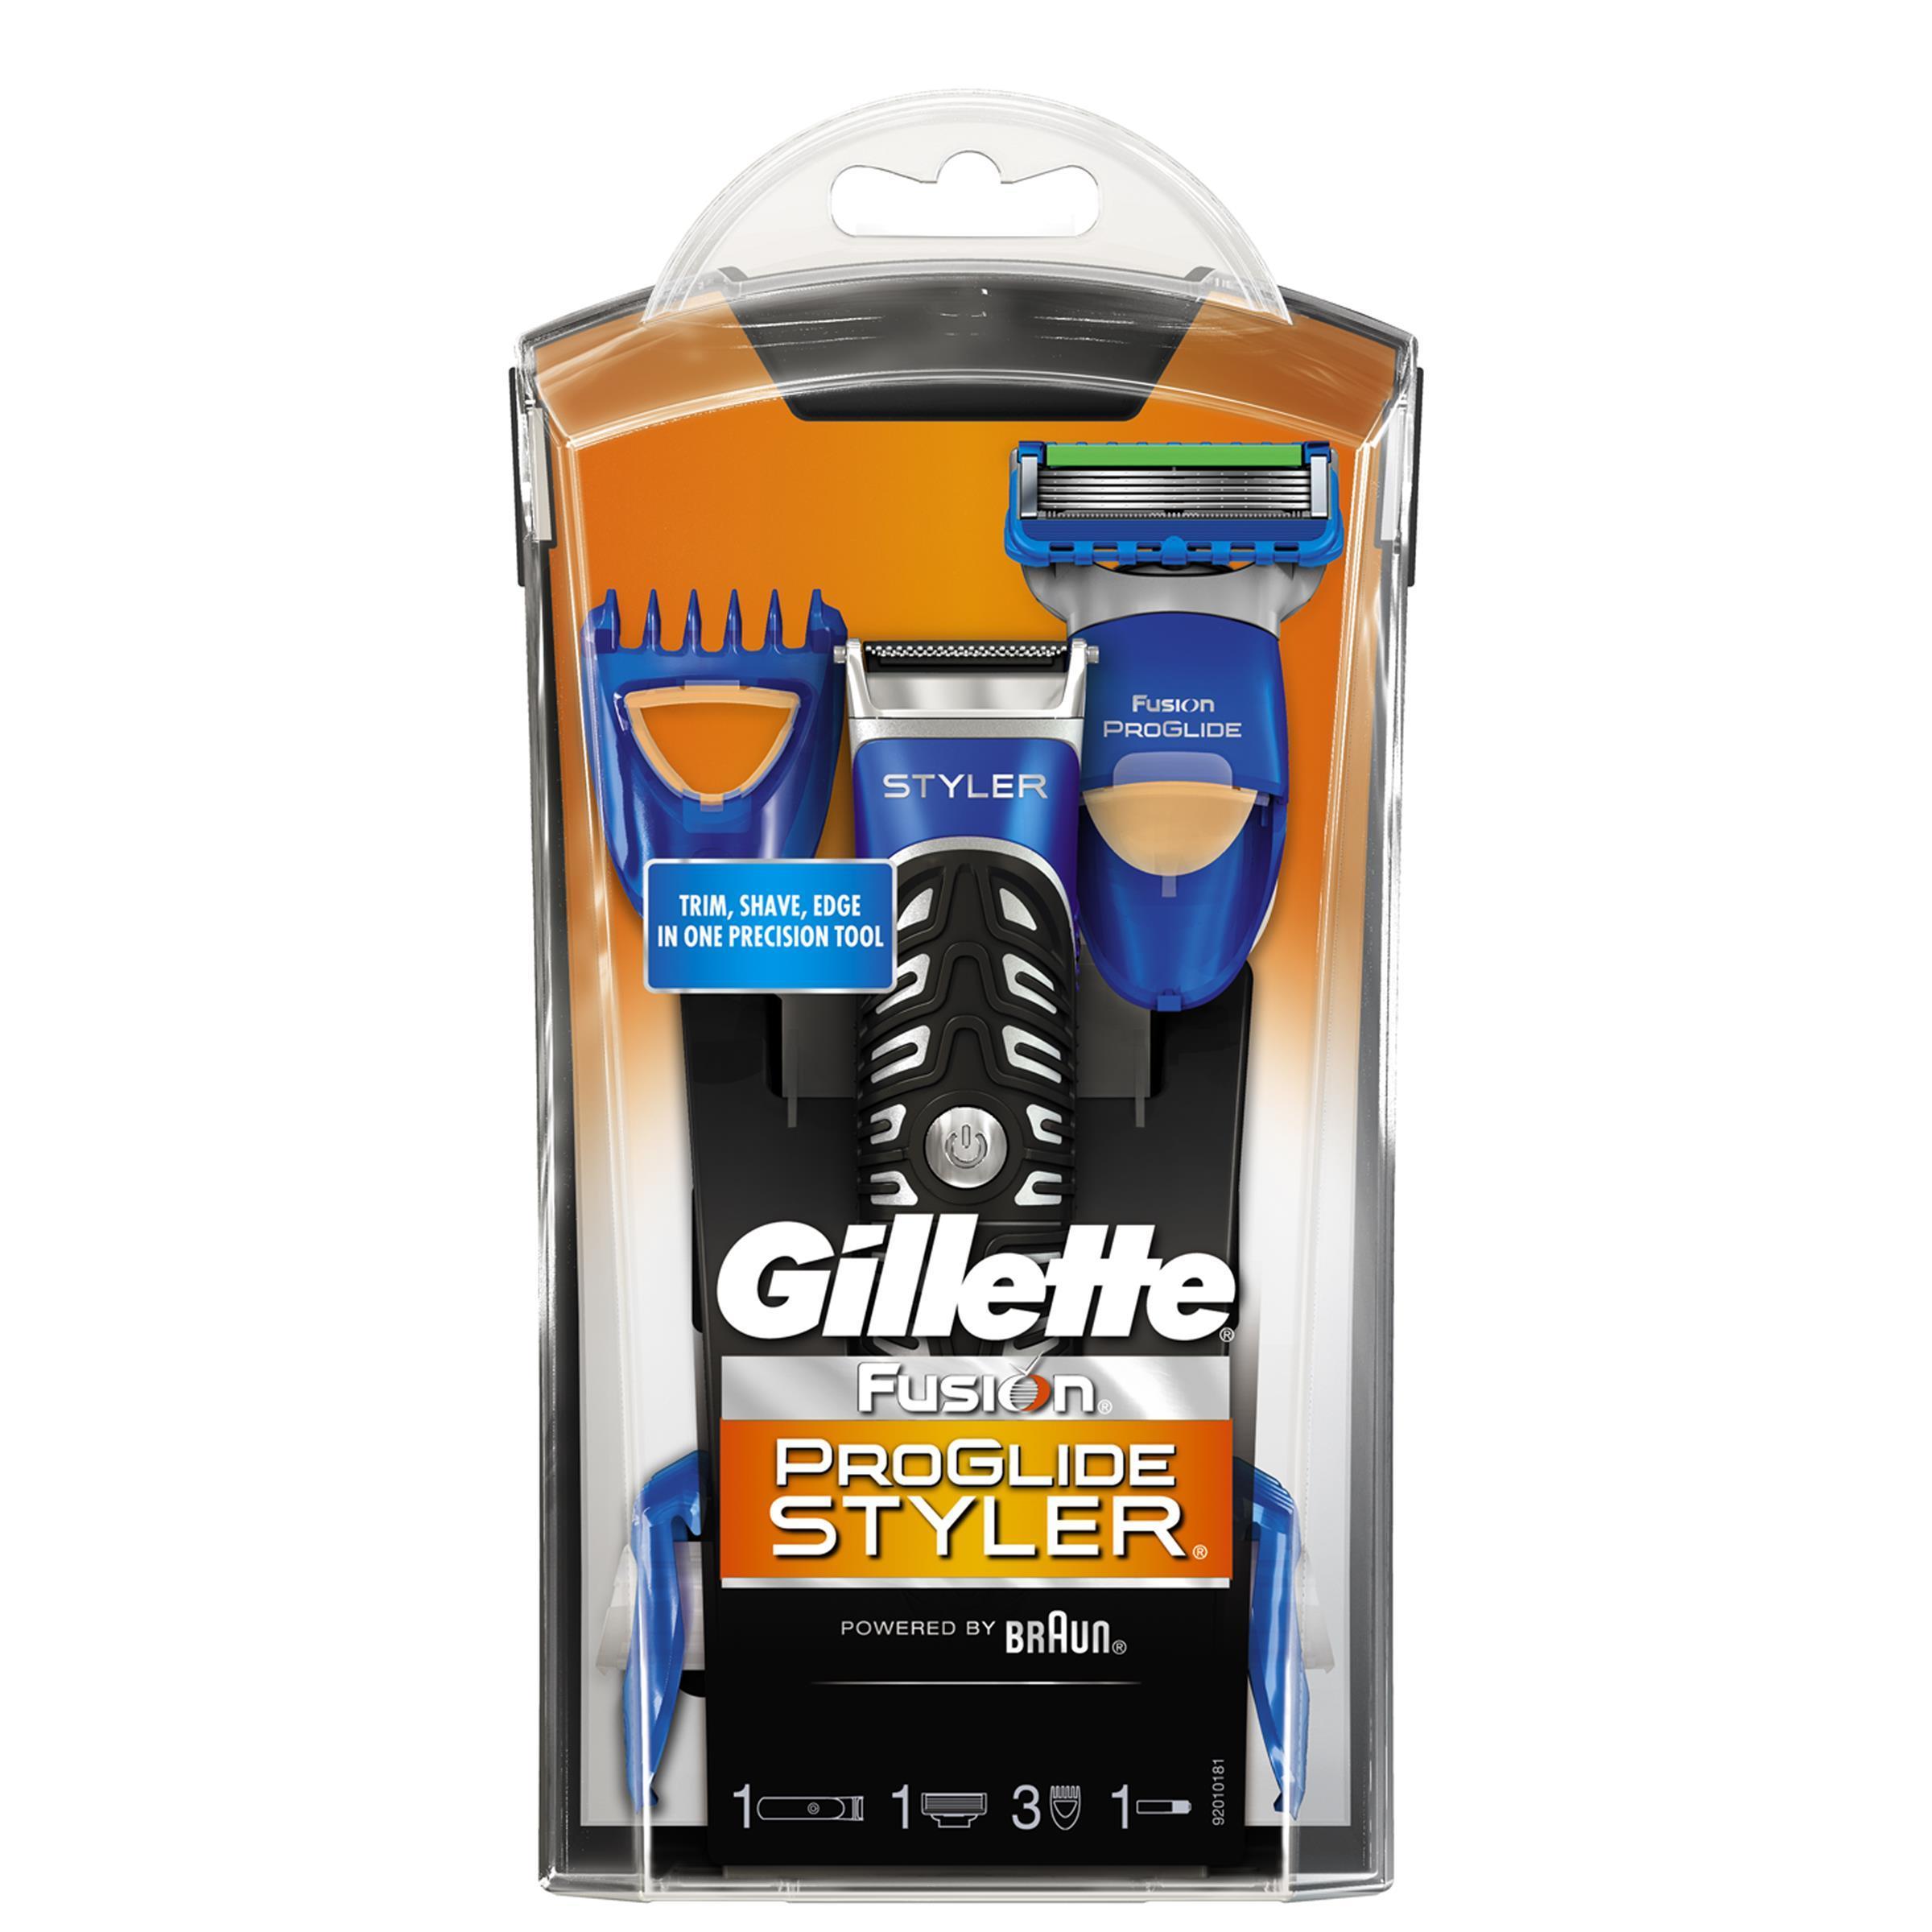 GILLETTE pack fusion proglide styler